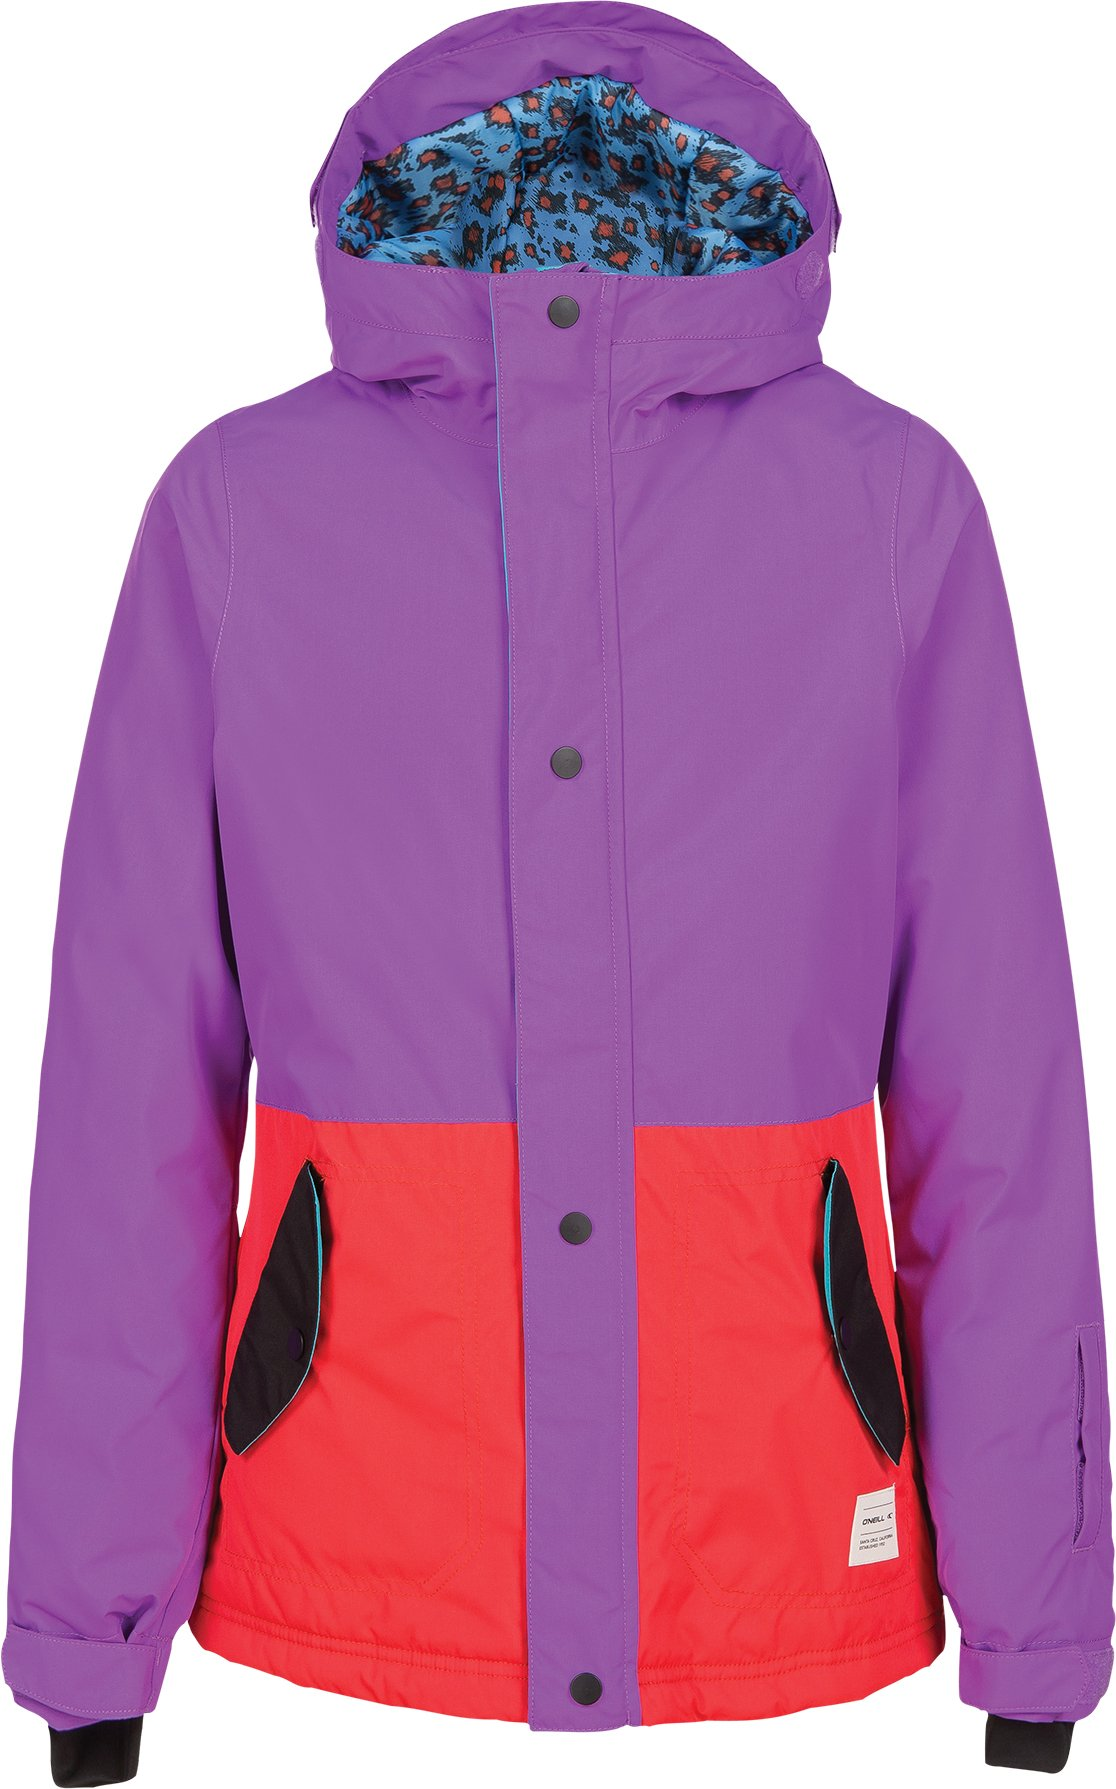 O'Neill Girls Flare Jacket, Grape Soda, Size 8